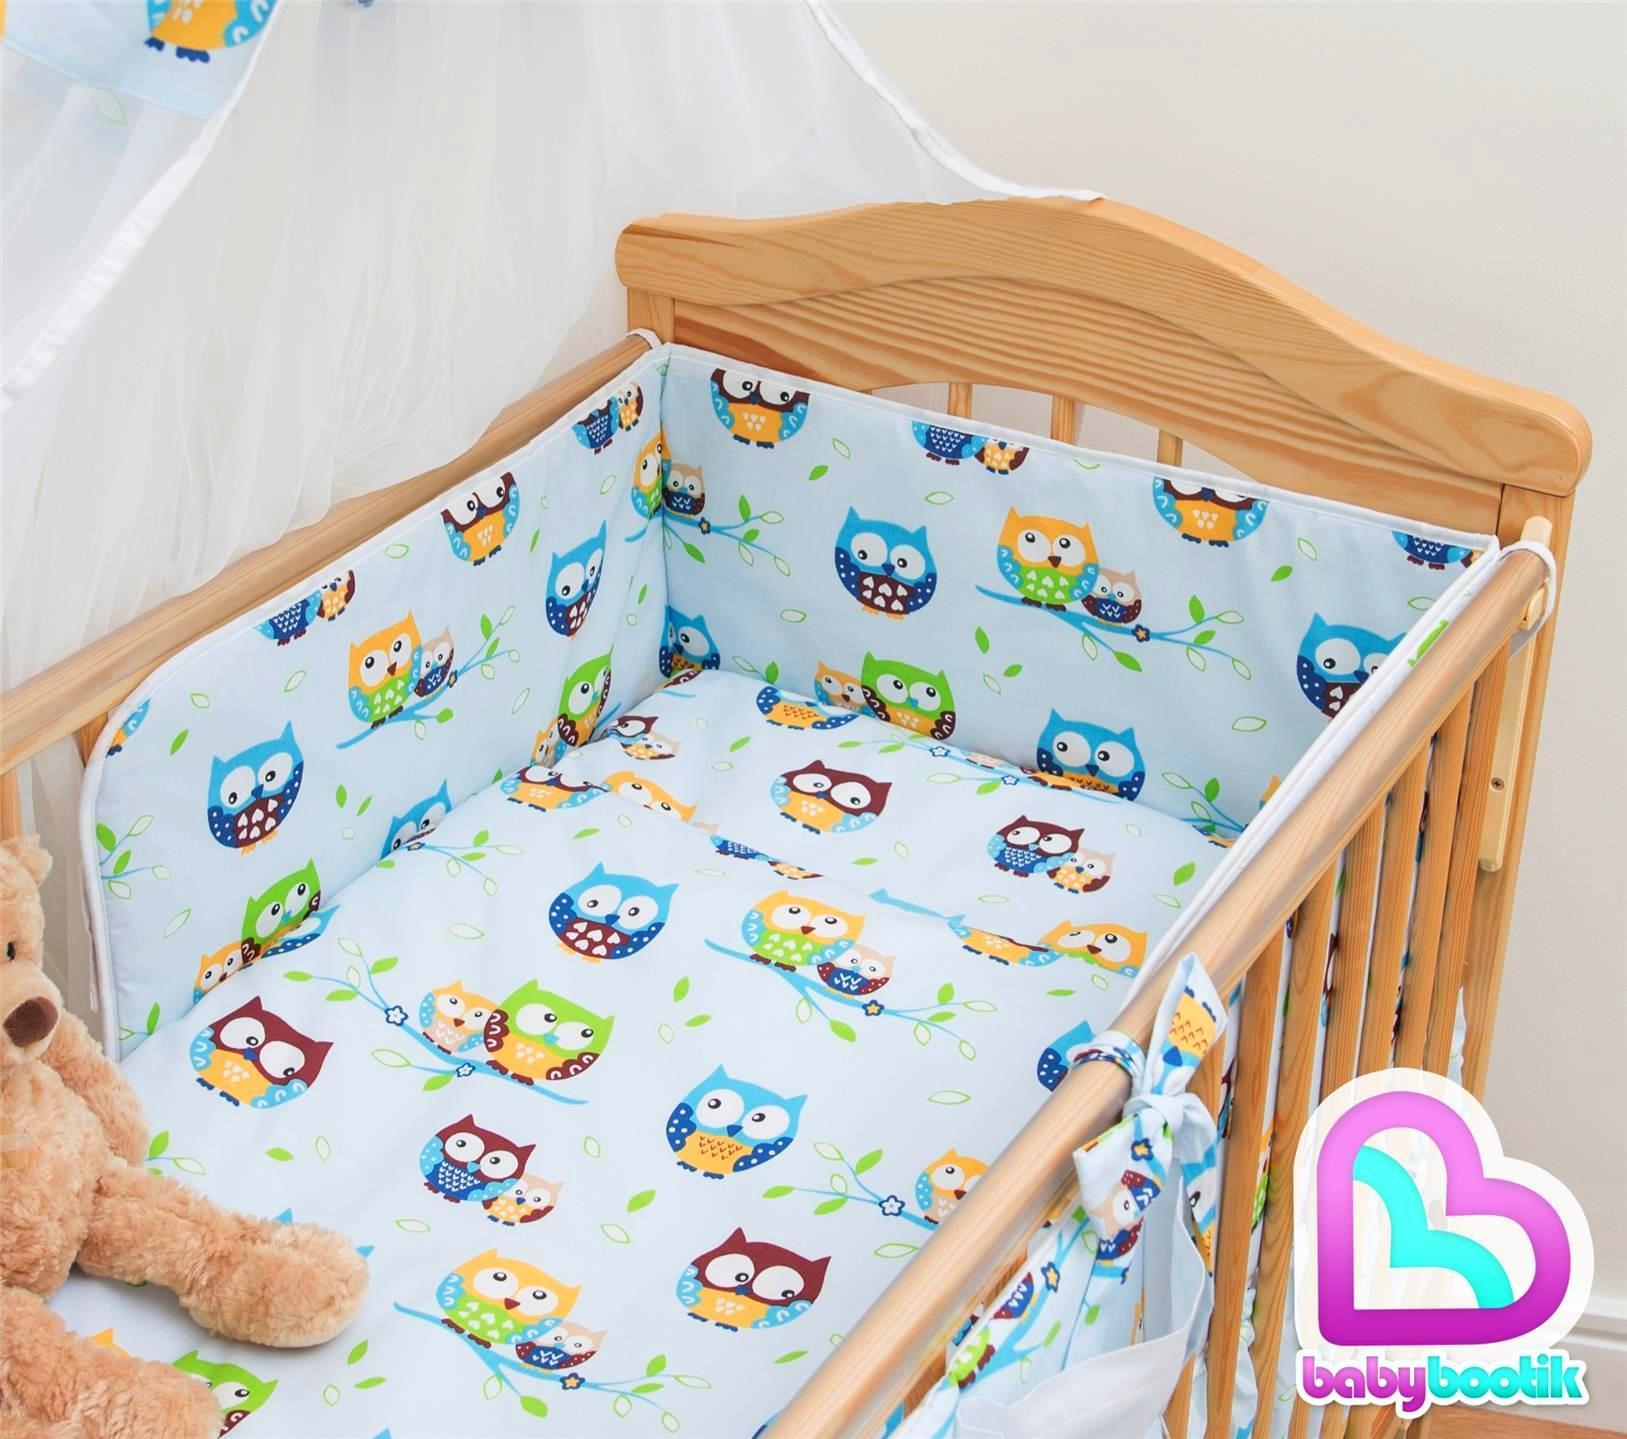 5 piece baby kinderzimmer kinderbett bettw sche set - Kinderbett set ...